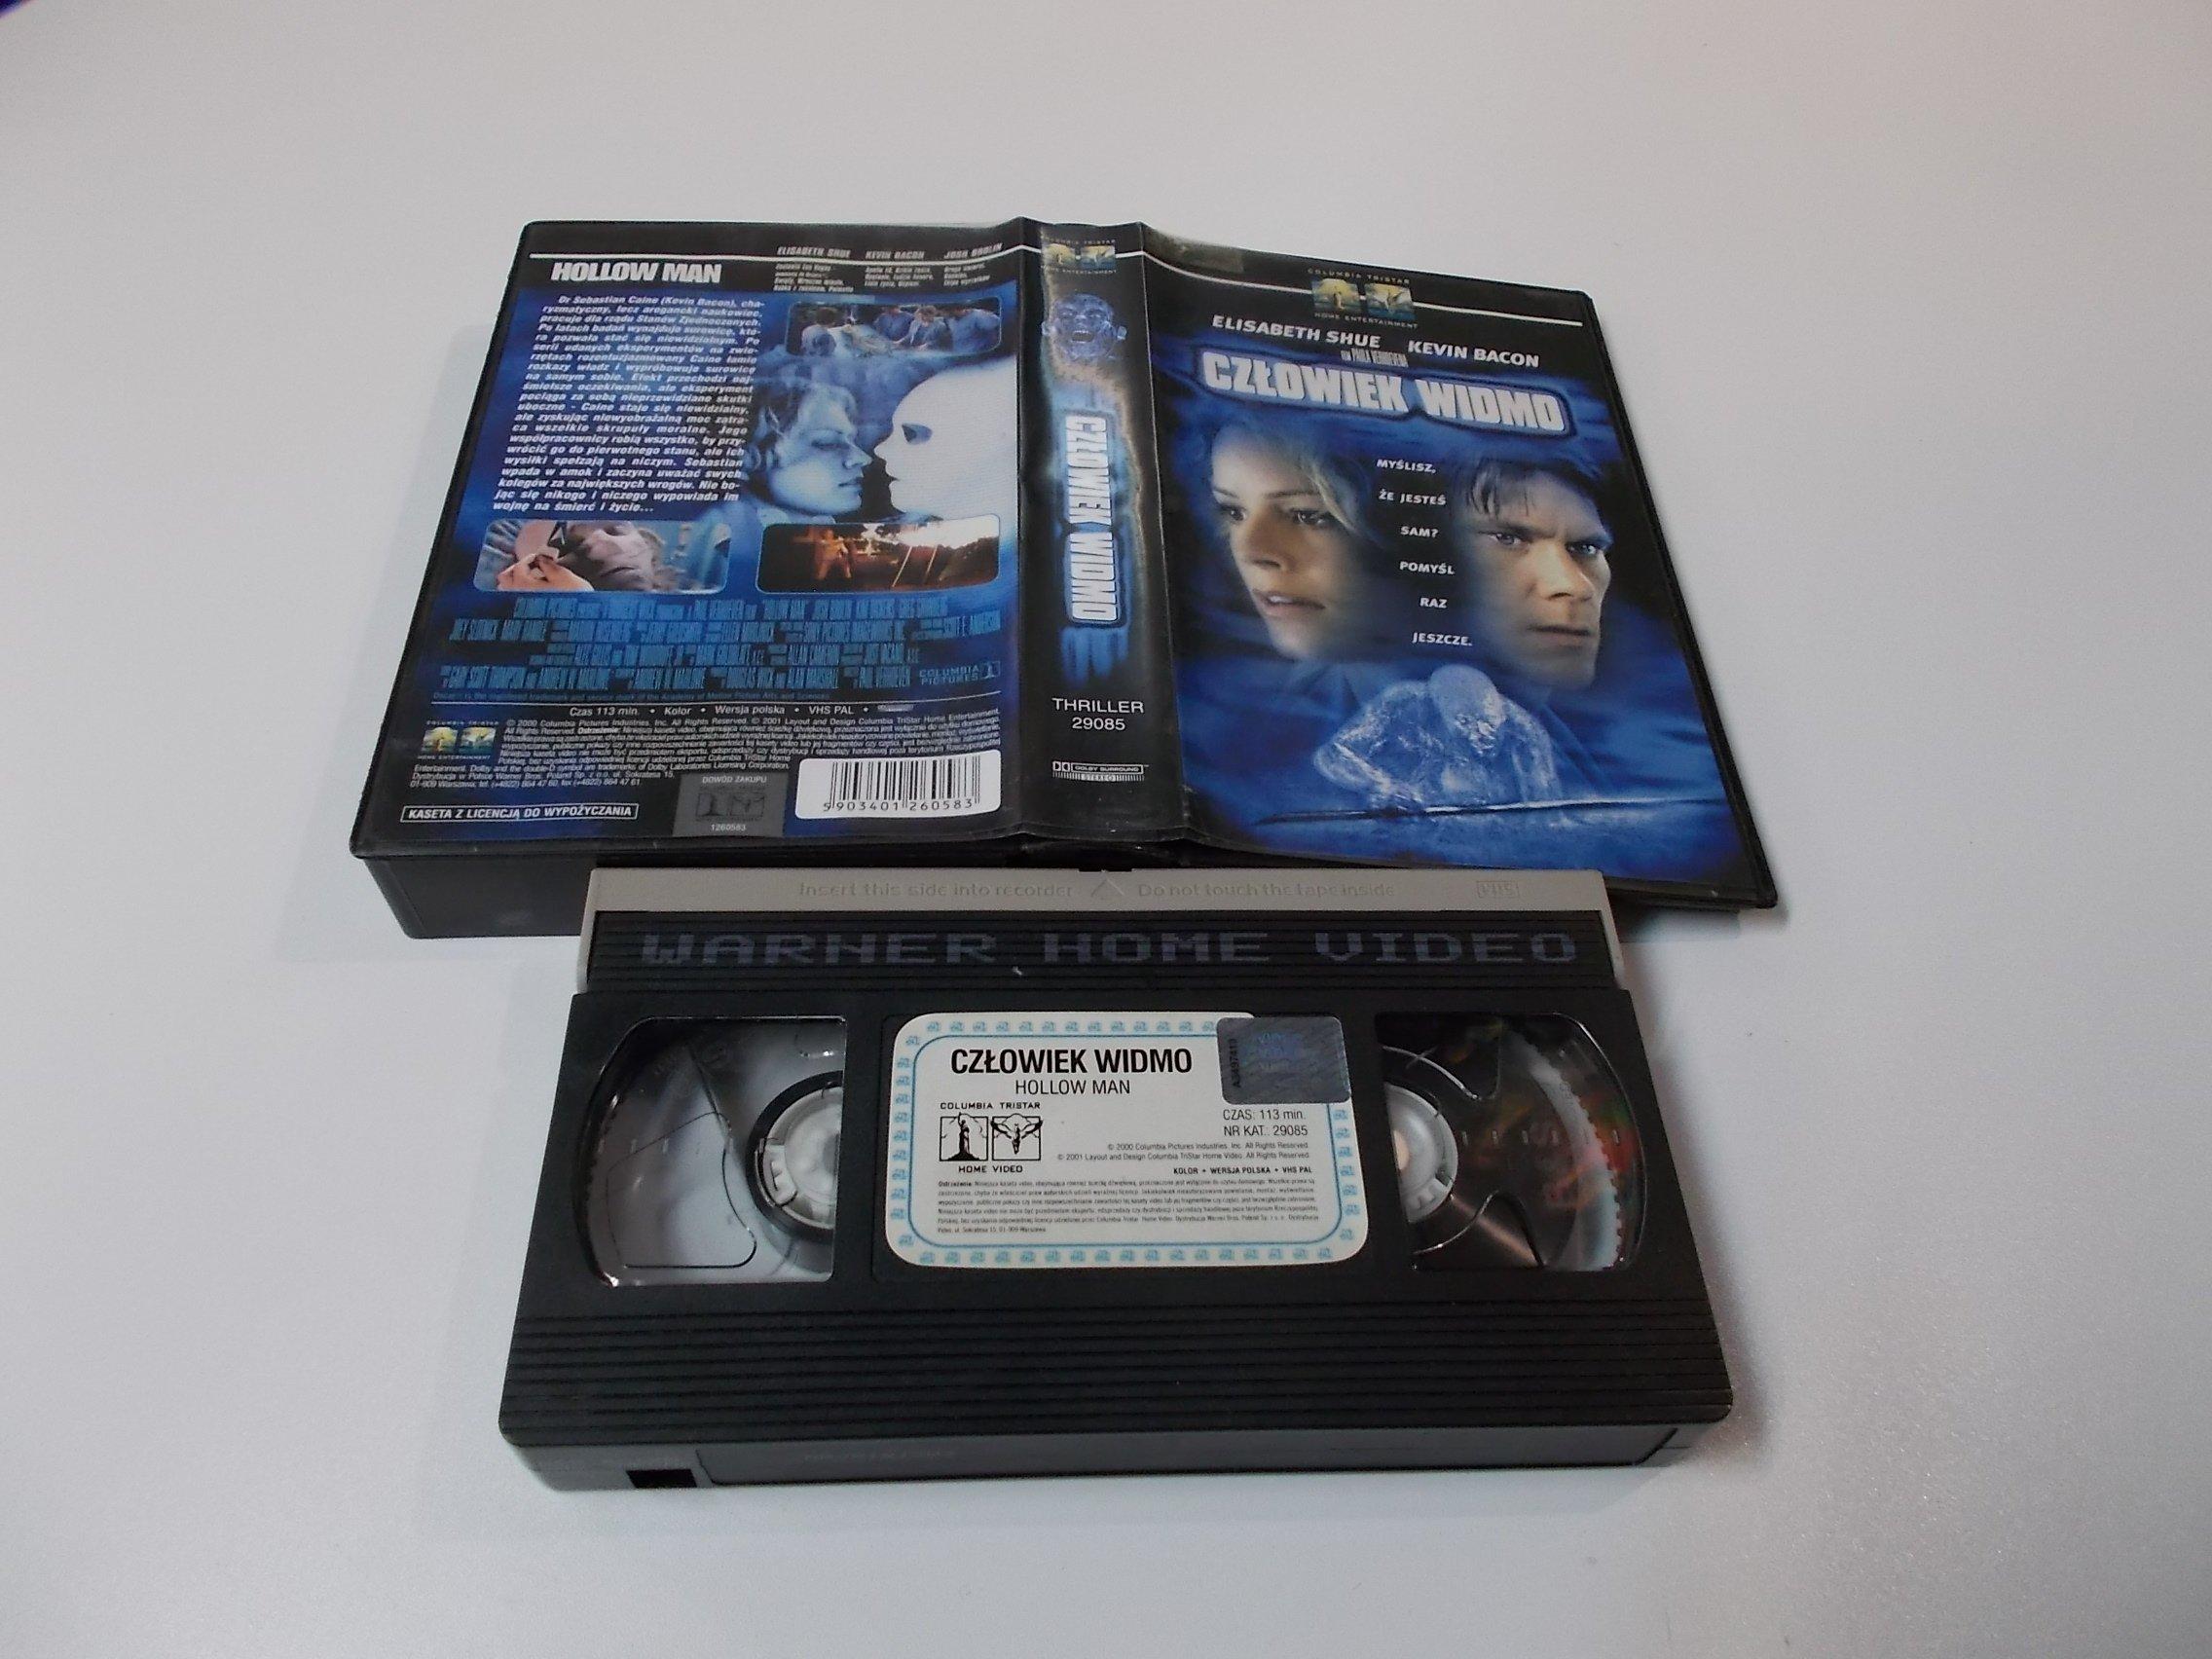 CZŁOWIEK WIDMO - VHS Kaseta Video - Opole 1628